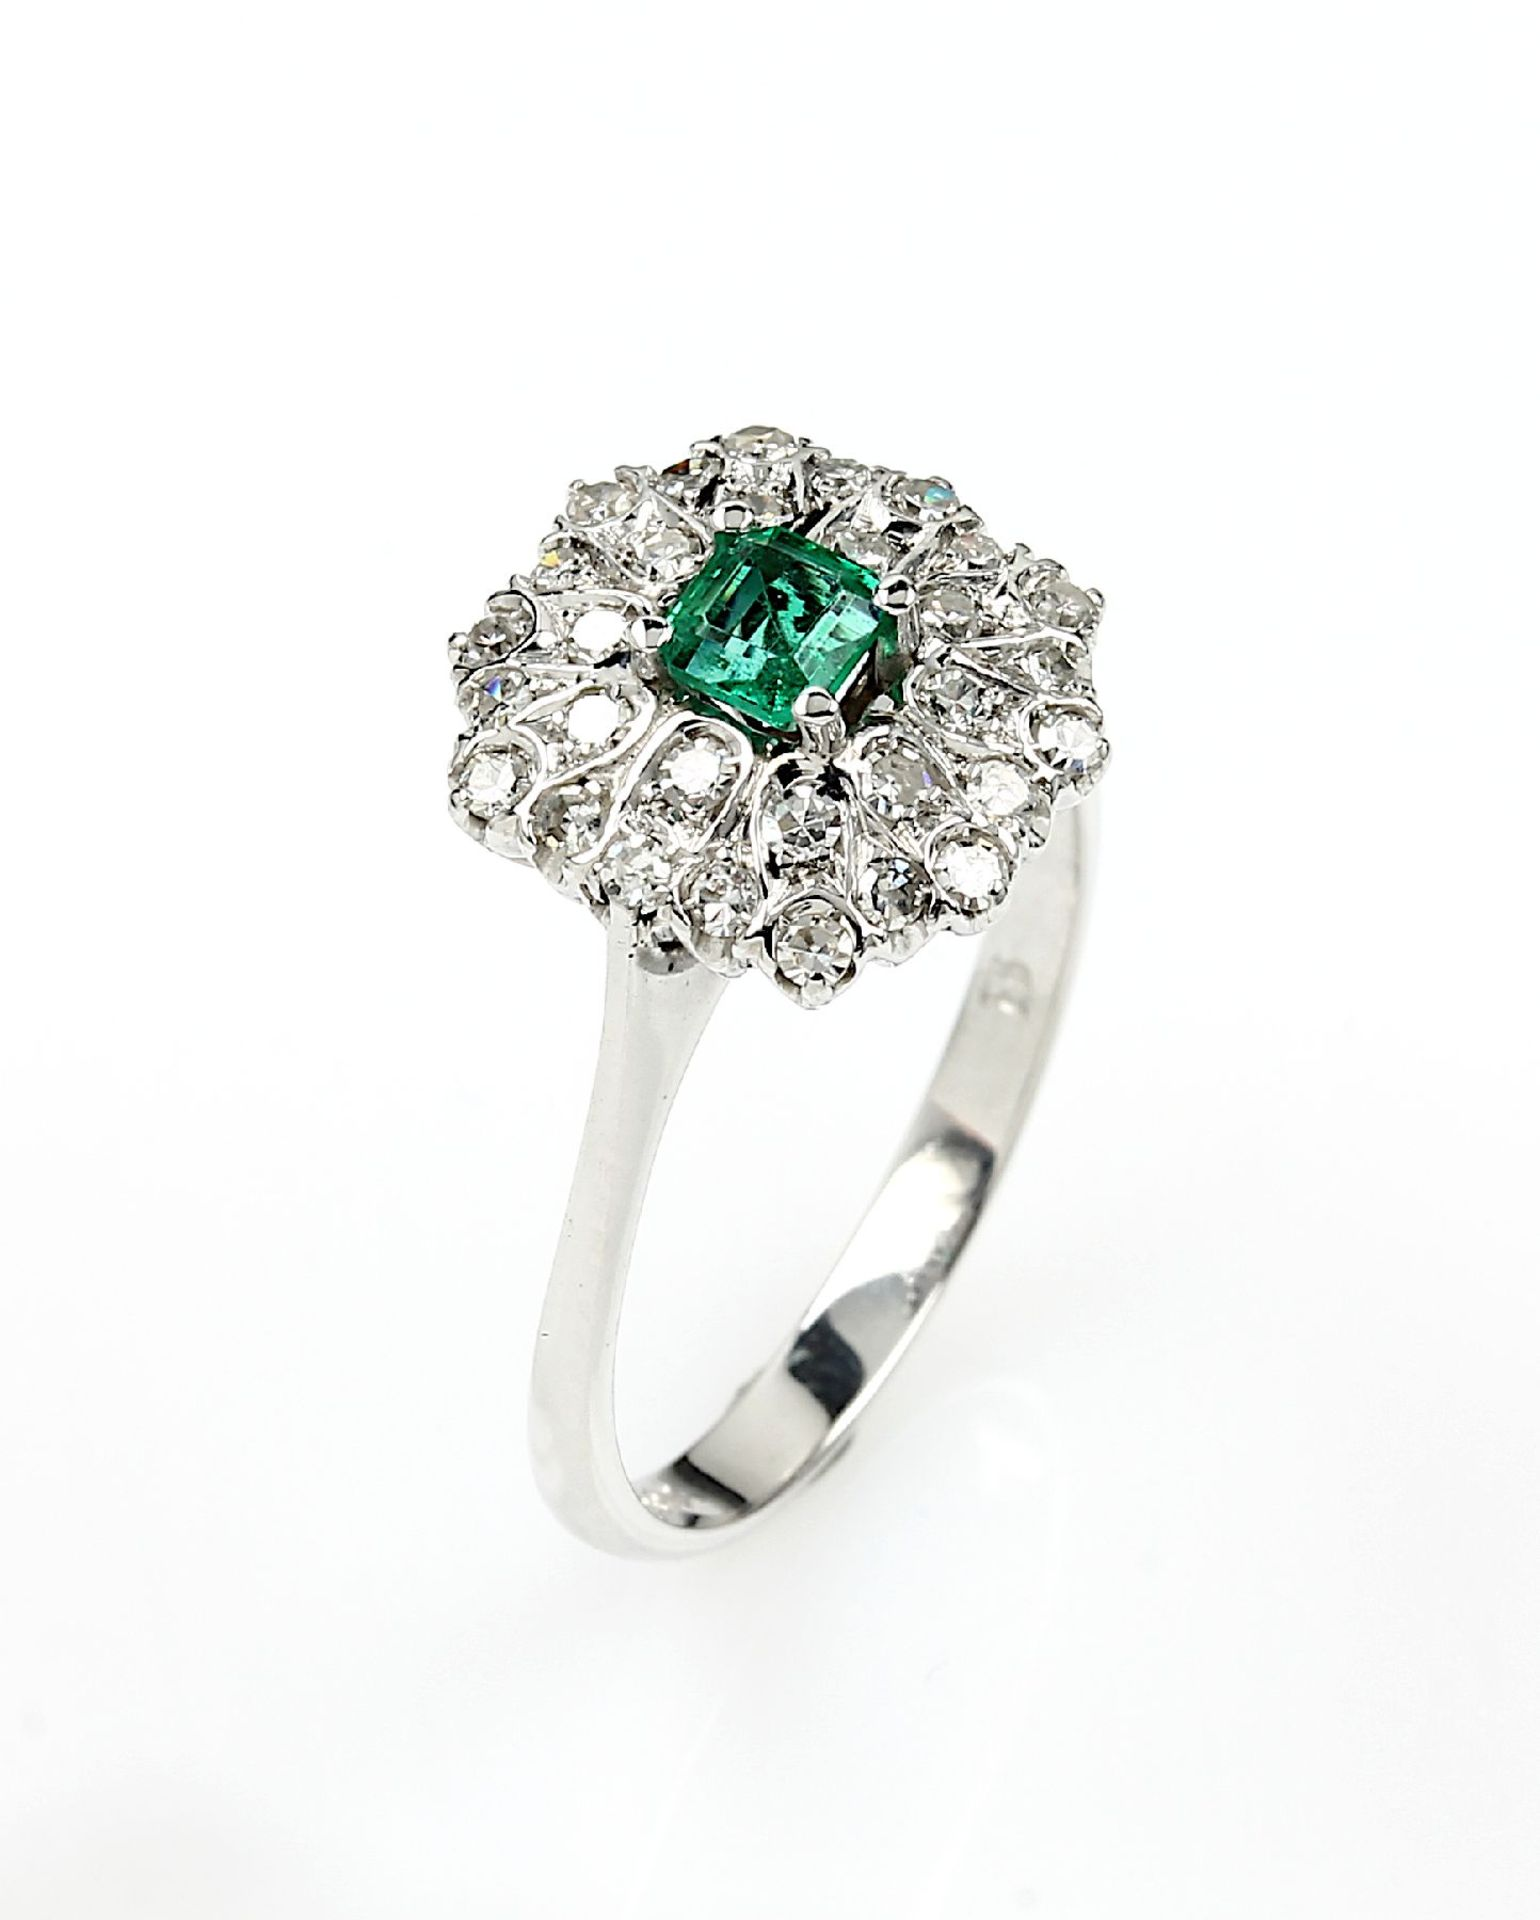 18 kt Gold Blütenring mit Smaragd und Diamanten, WG 750/000, mittig rechteckig facett. Smaragd ca.